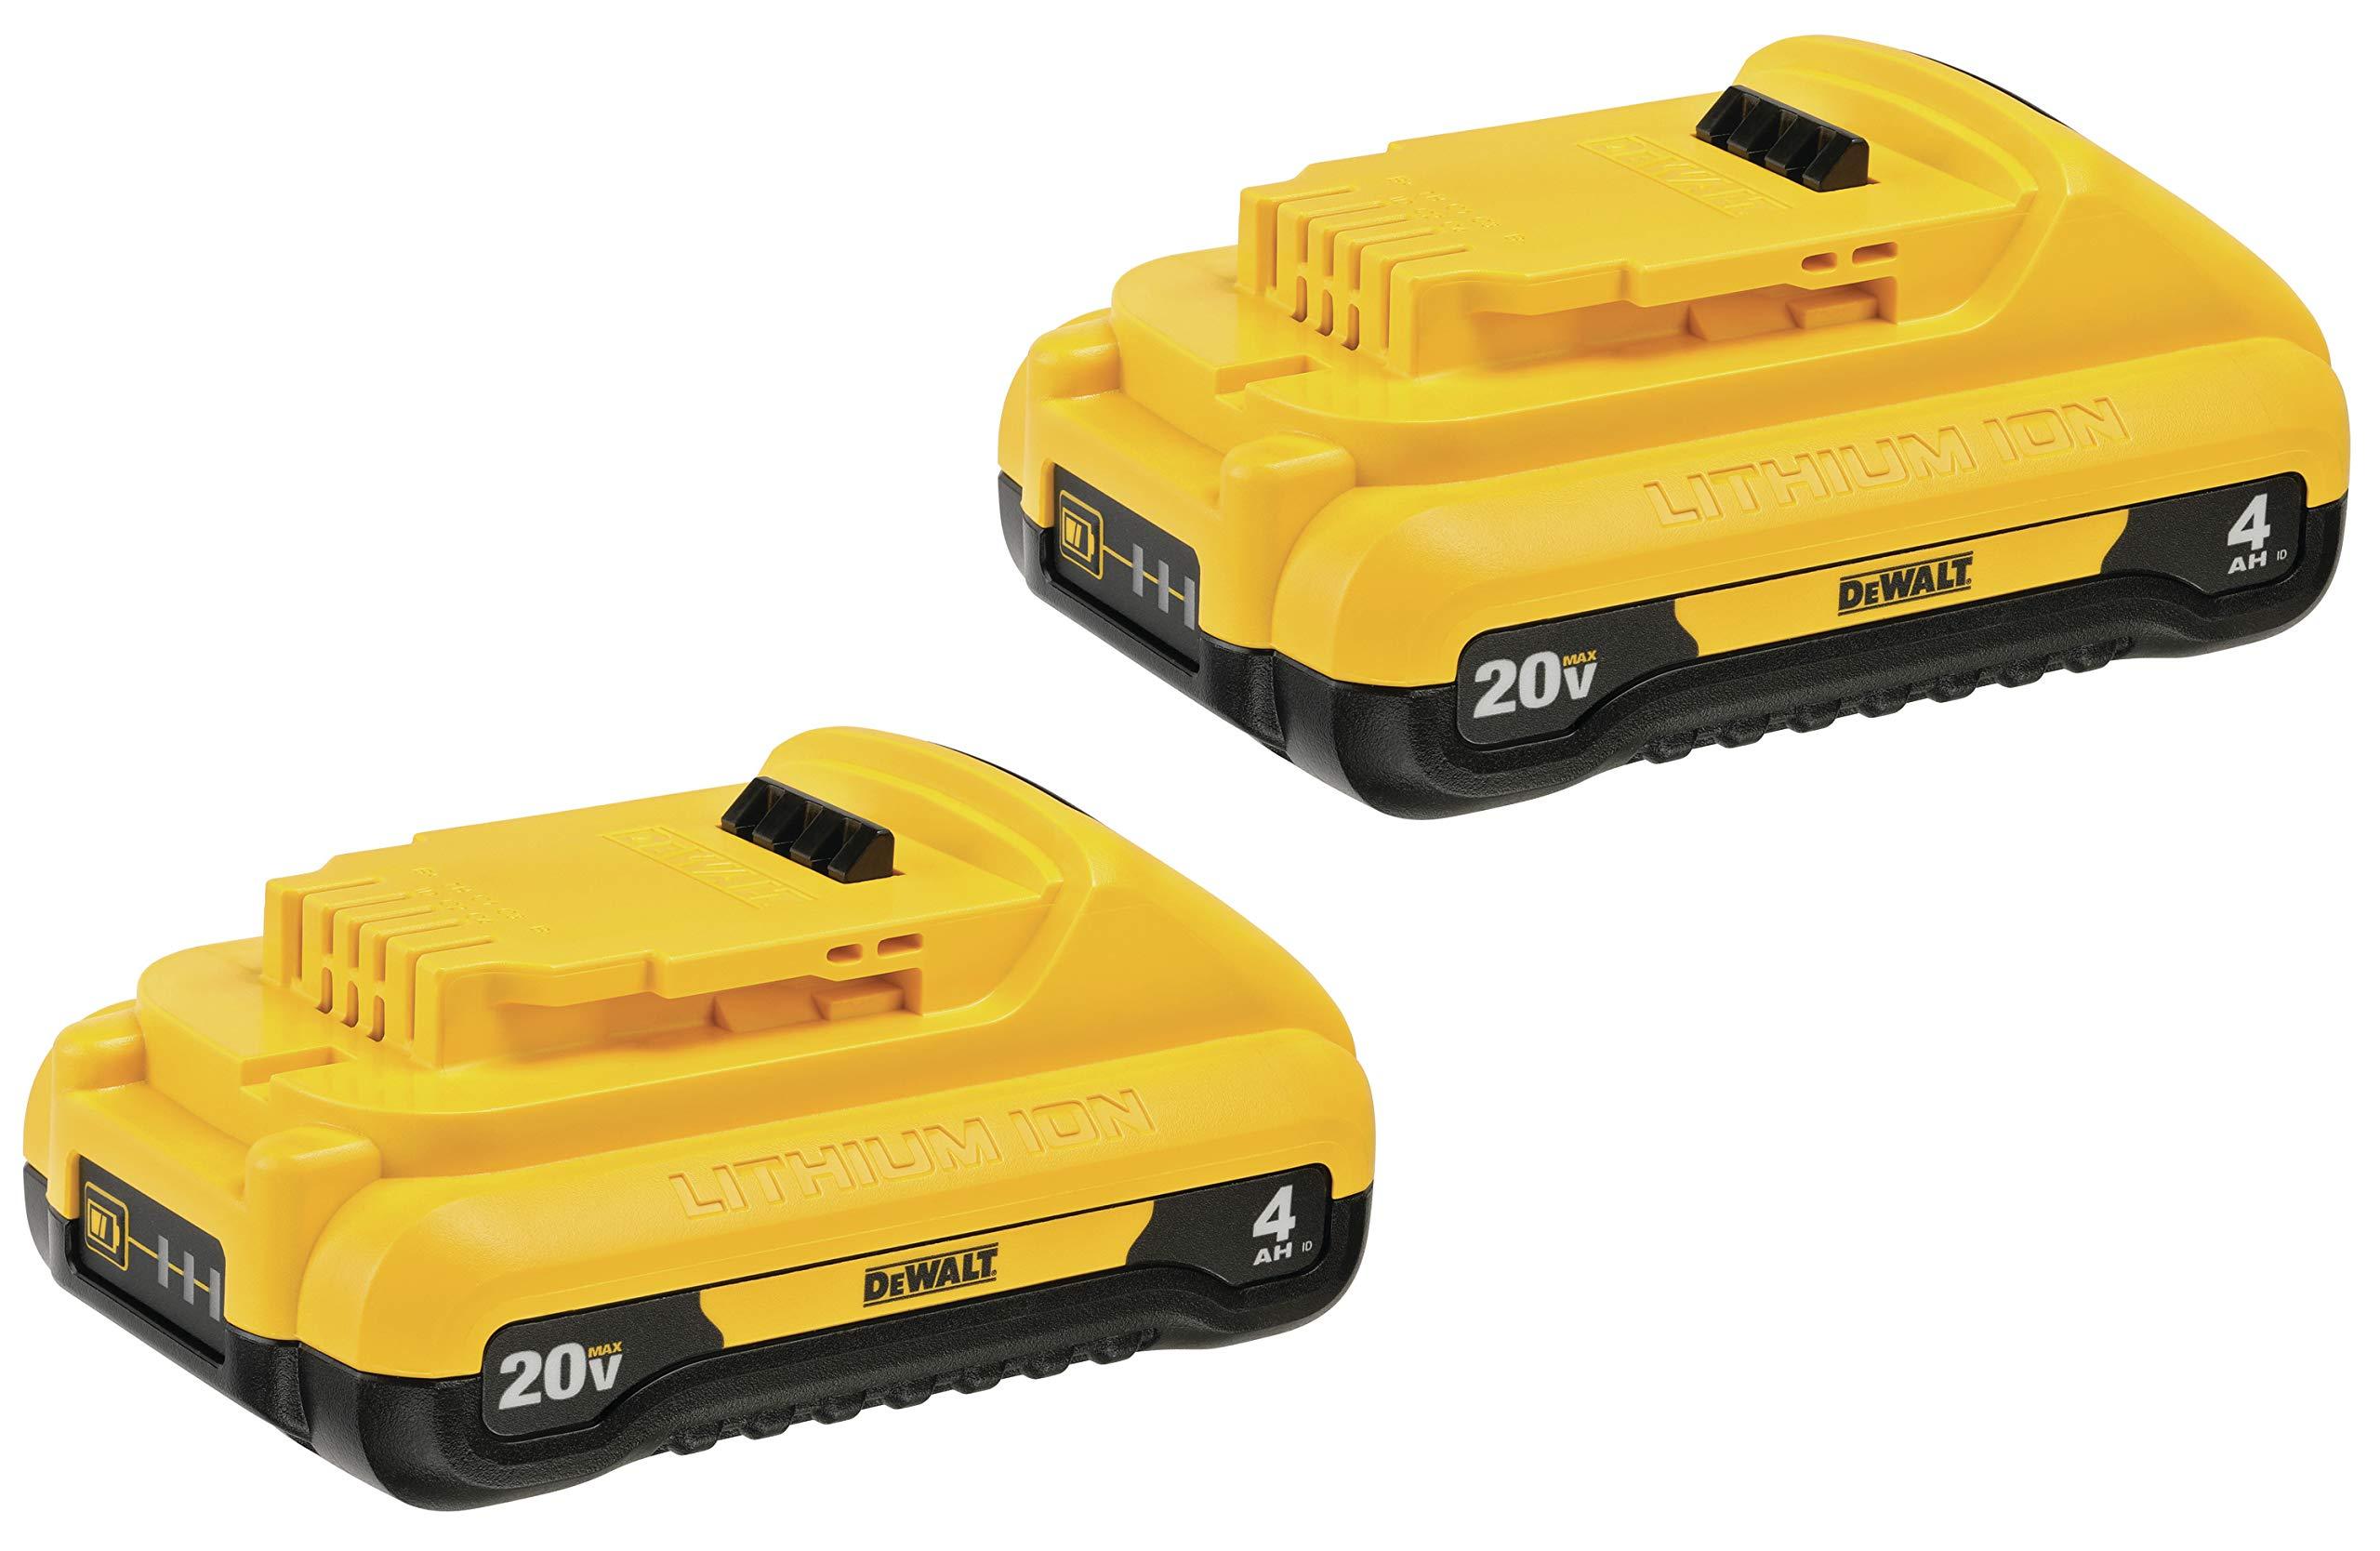 2 Baterias Originales DEWALT 20V MAX 4.0ah DCB240